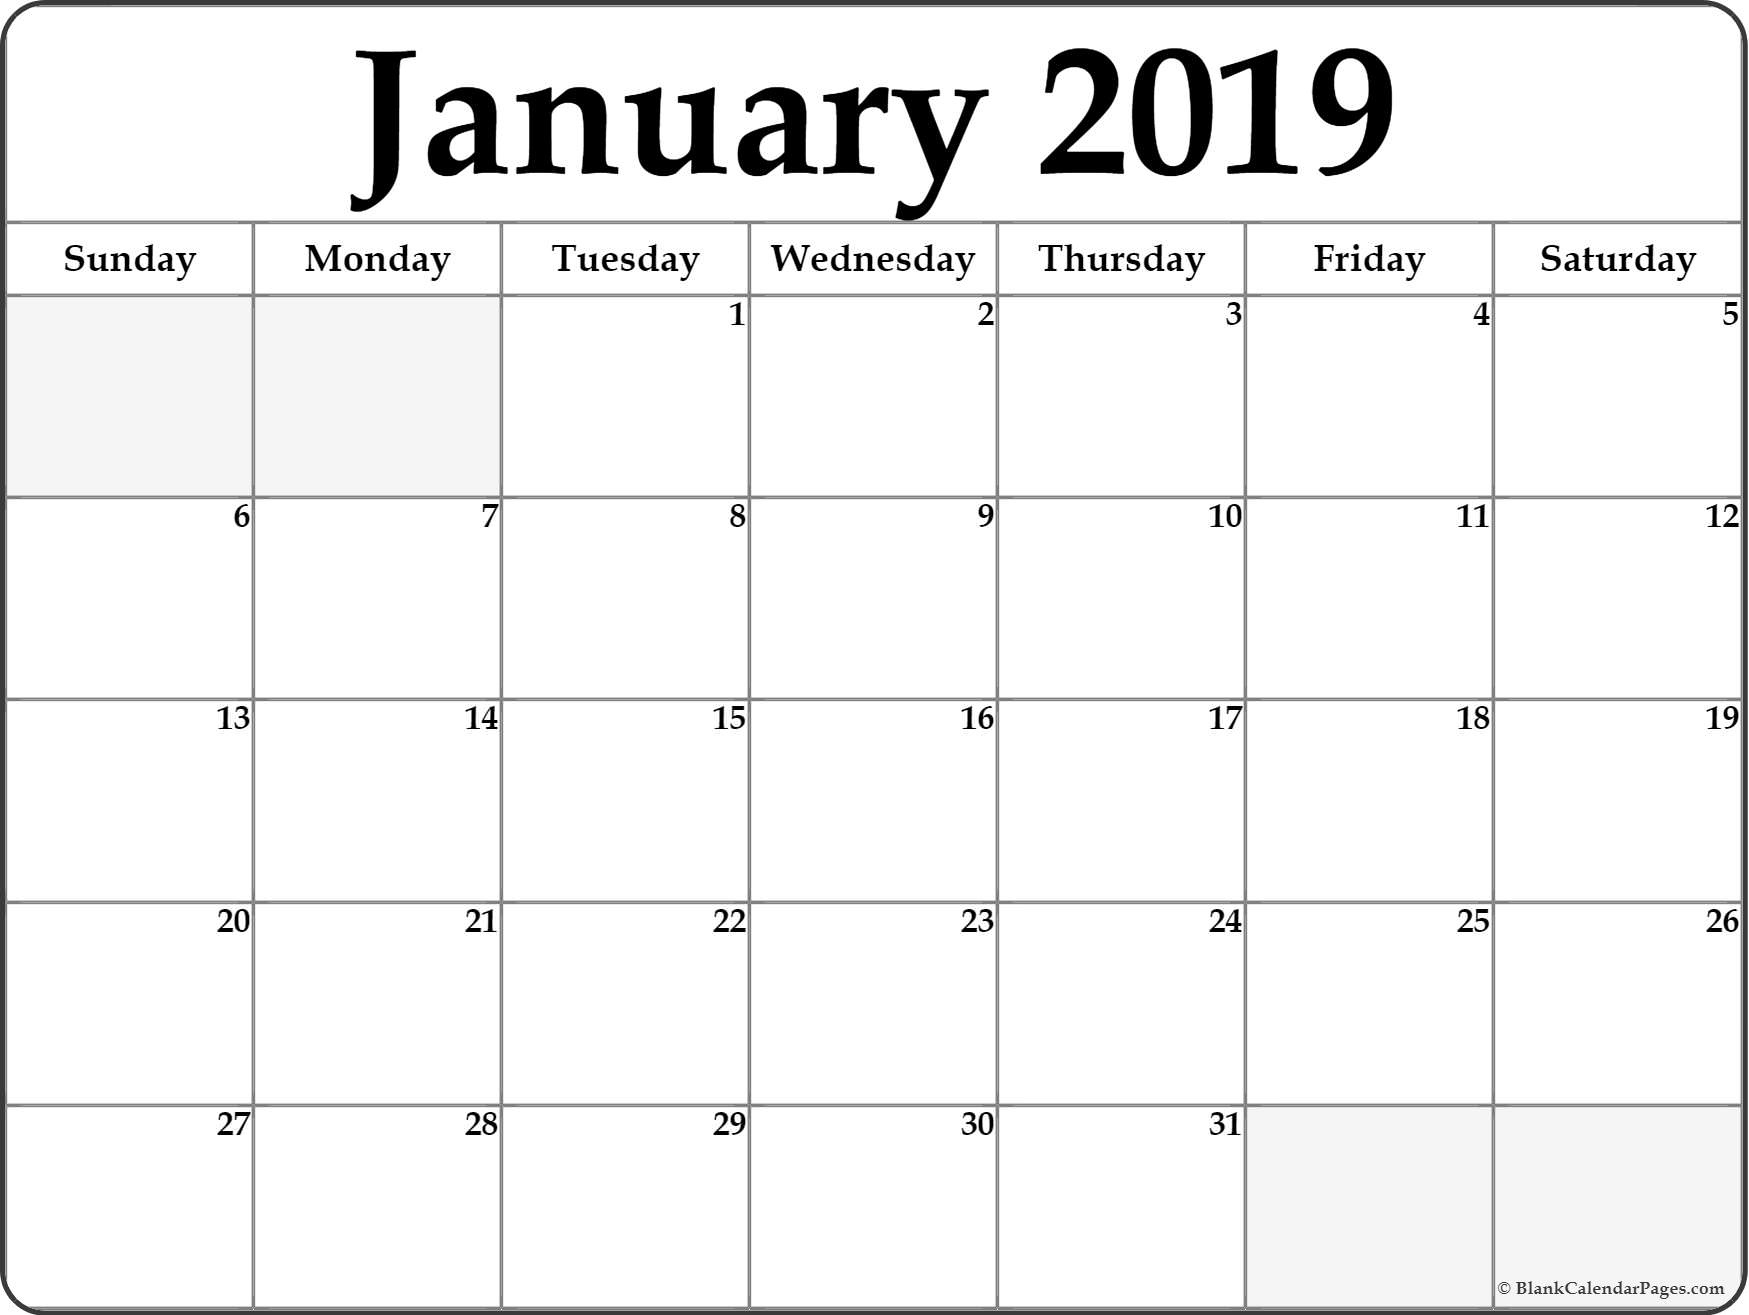 January 2019 Calendar | Free Printable Monthly Calendars Free Printable Calendar Double Month